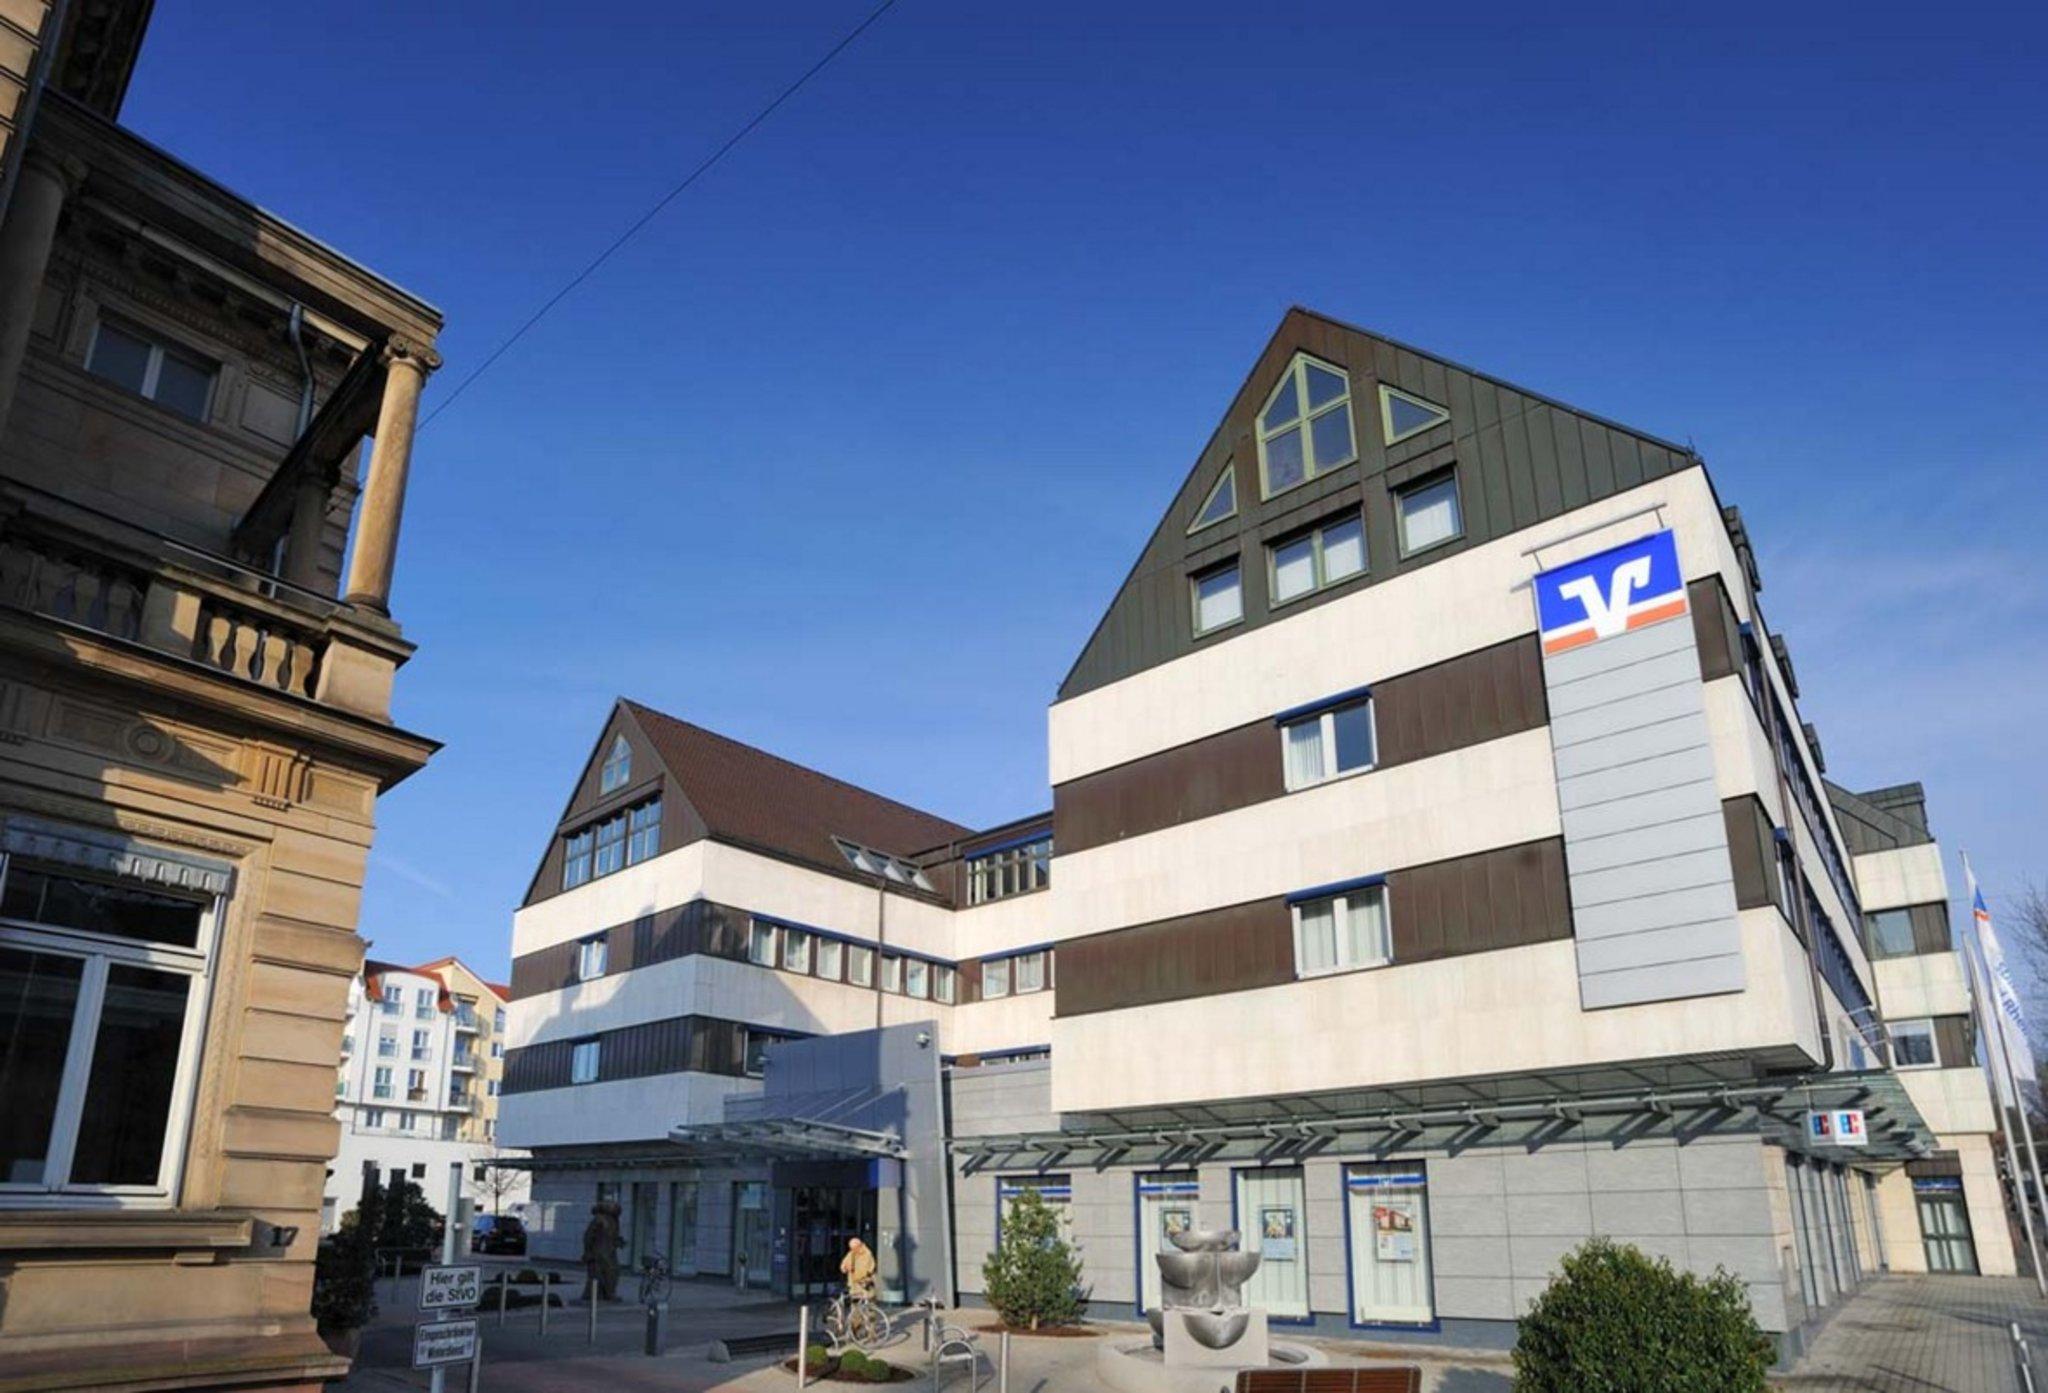 Vr Bank Lingenfeld Offnungszeiten